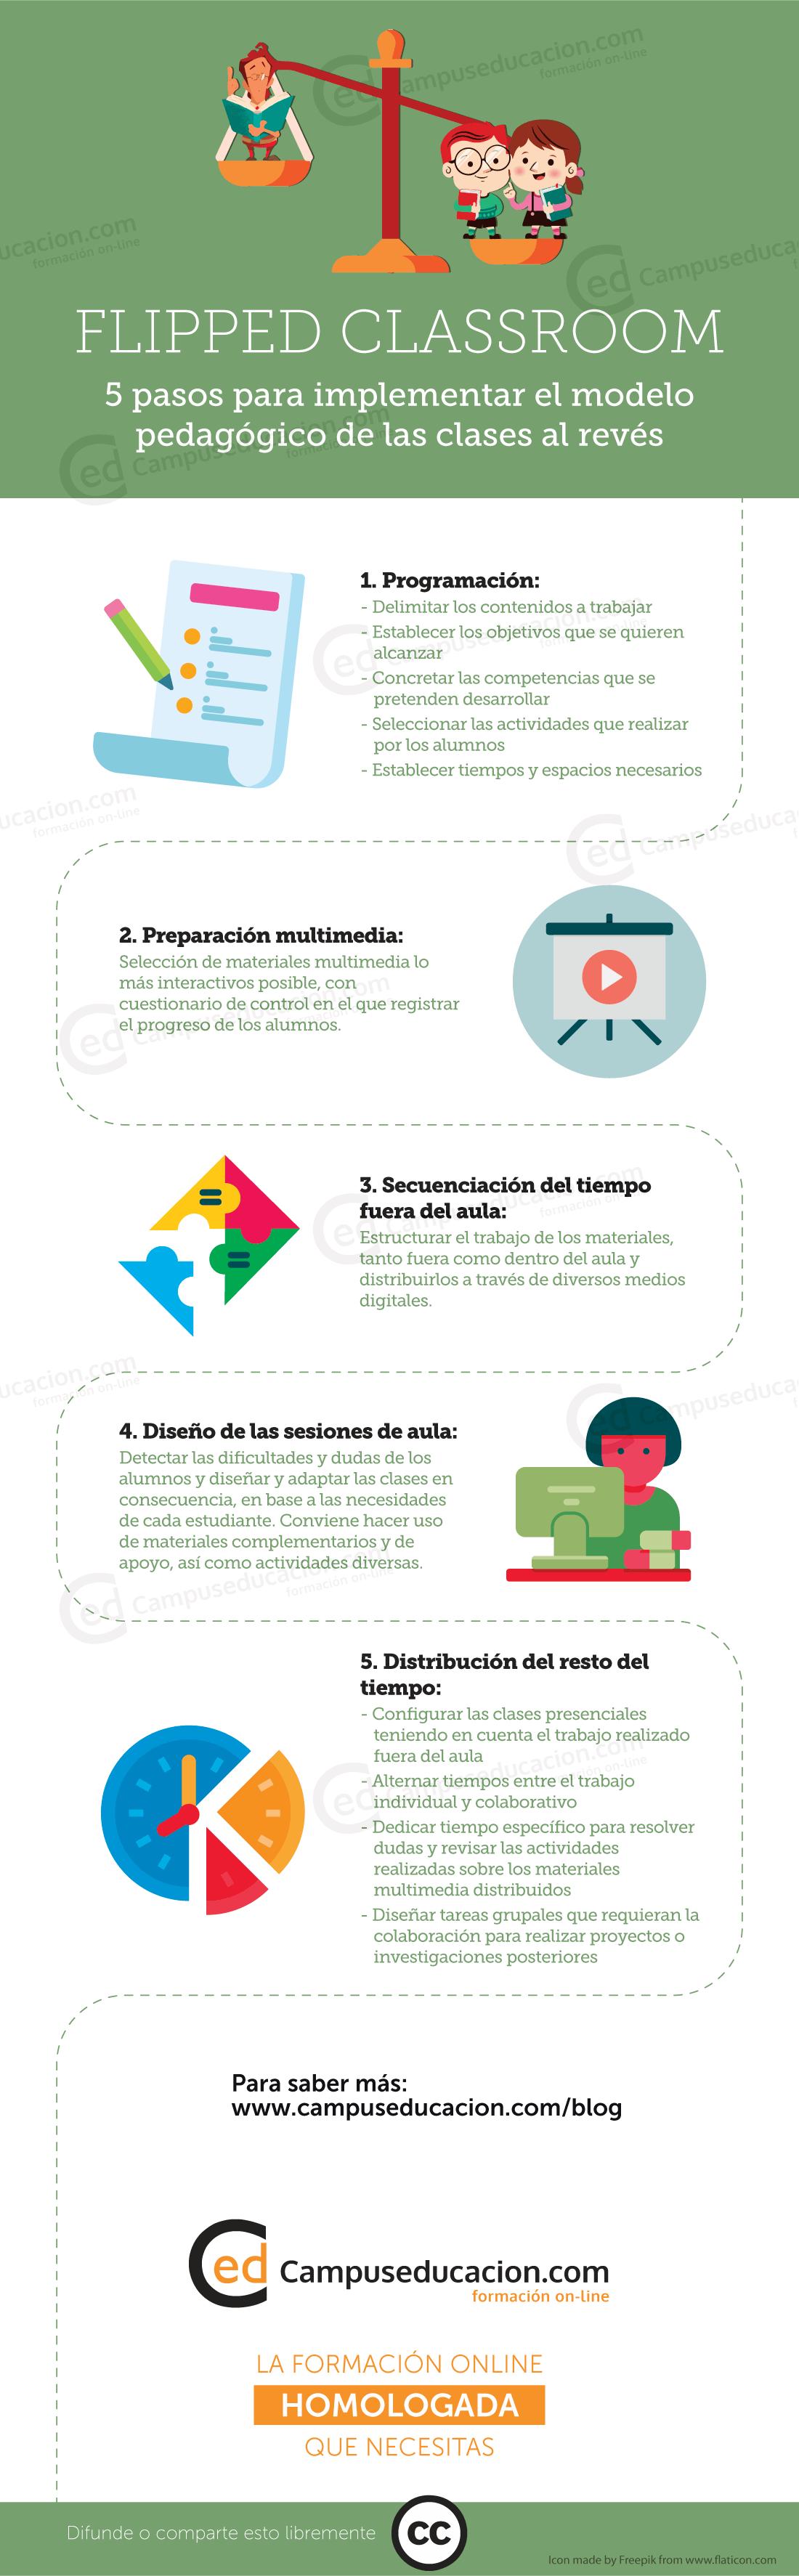 Infografía 5 pasos para implementar el modelo flipped classroom